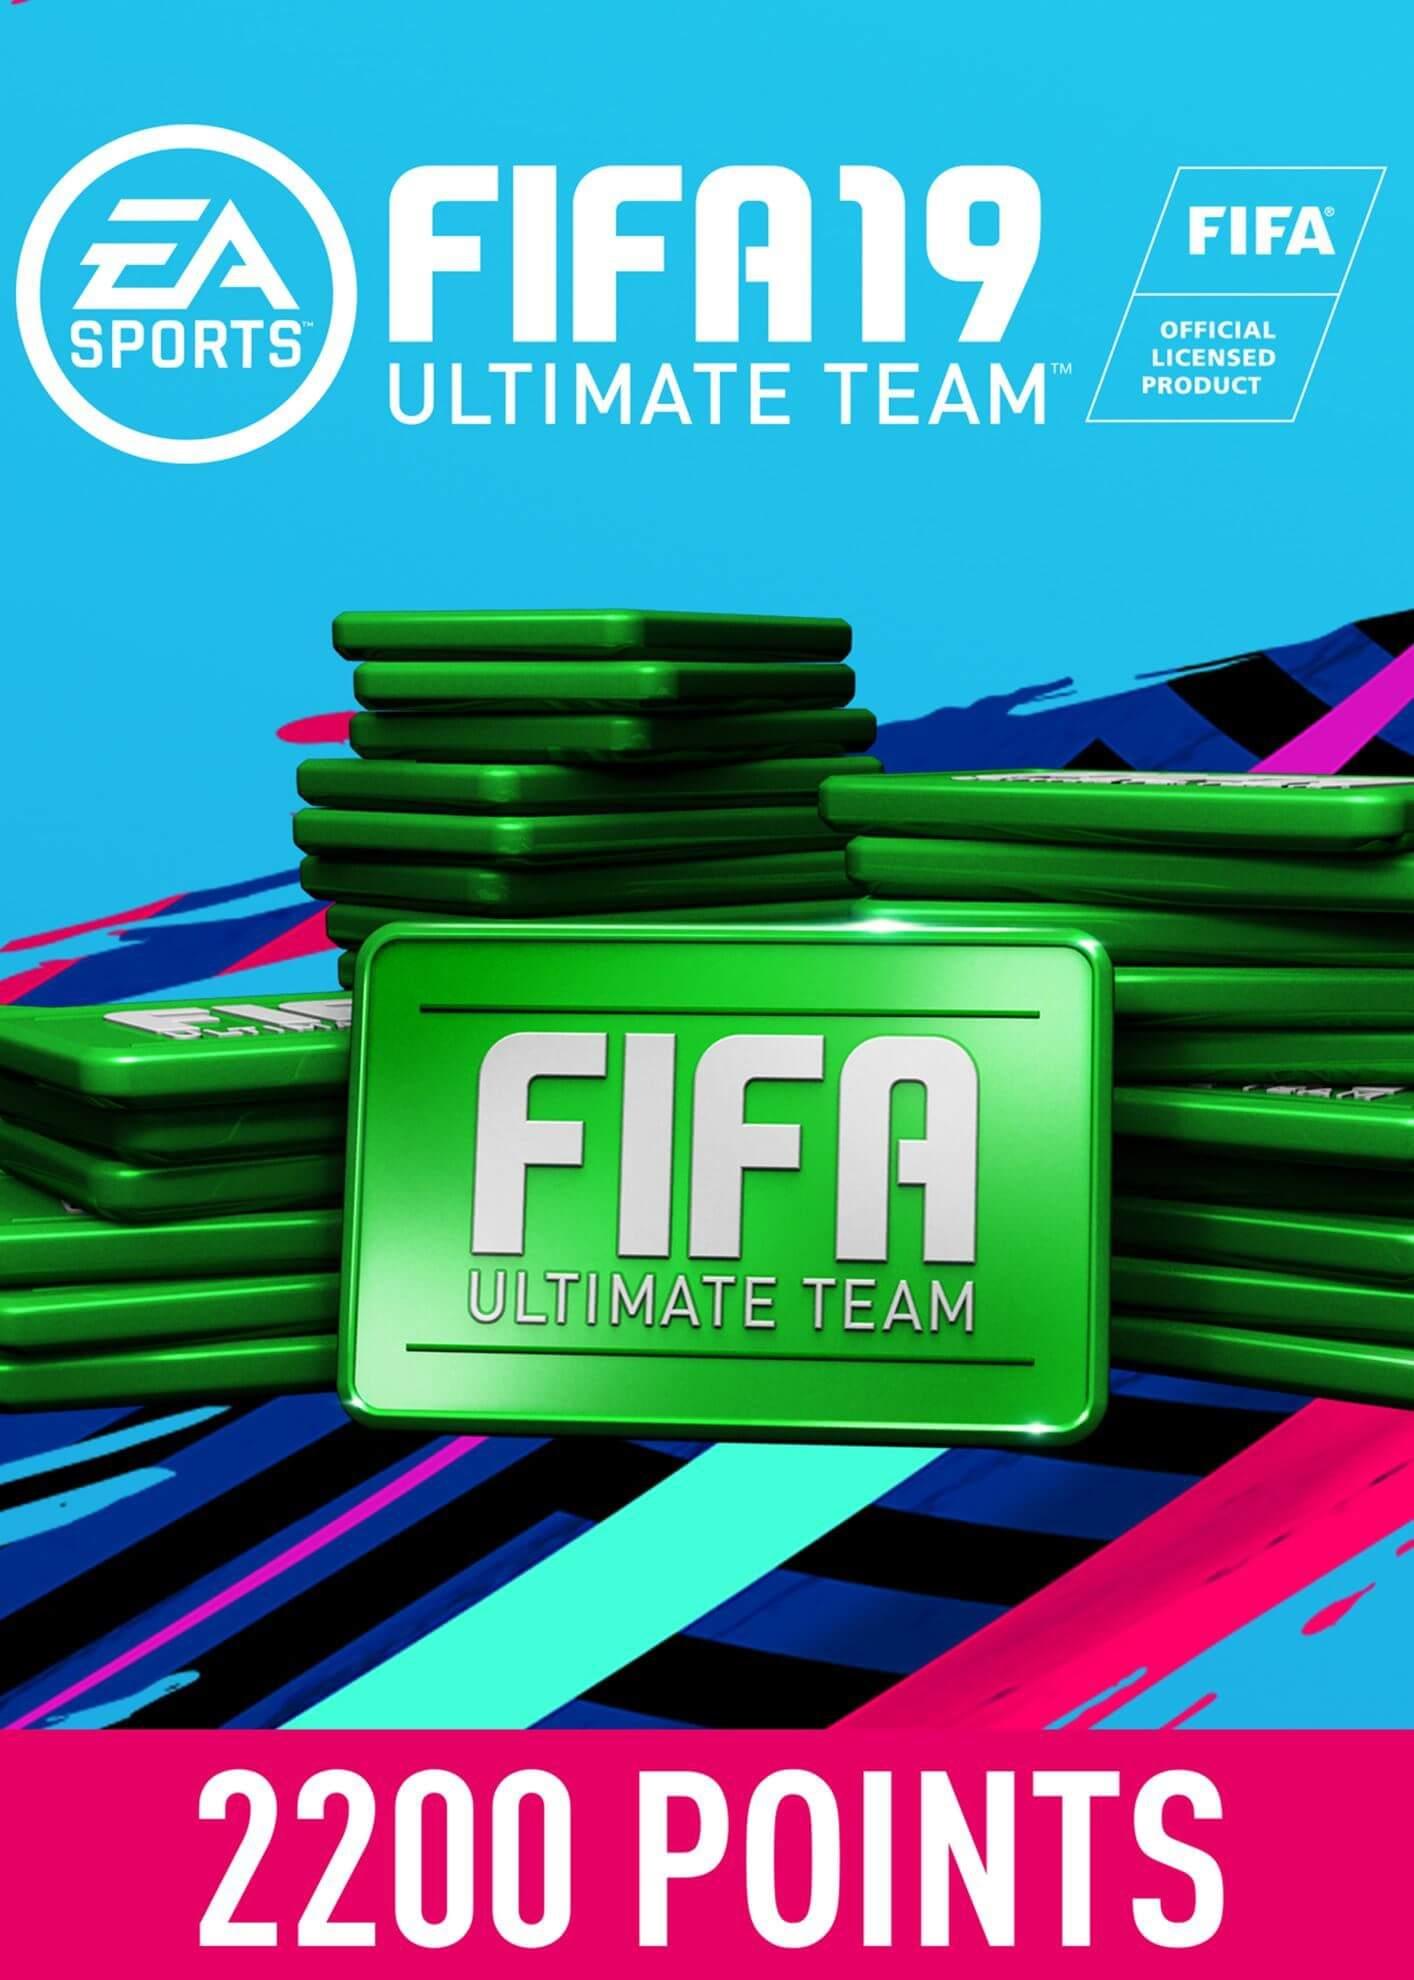 FIFA 19 ULTIMATE TEAM FIFA POINTS 2200